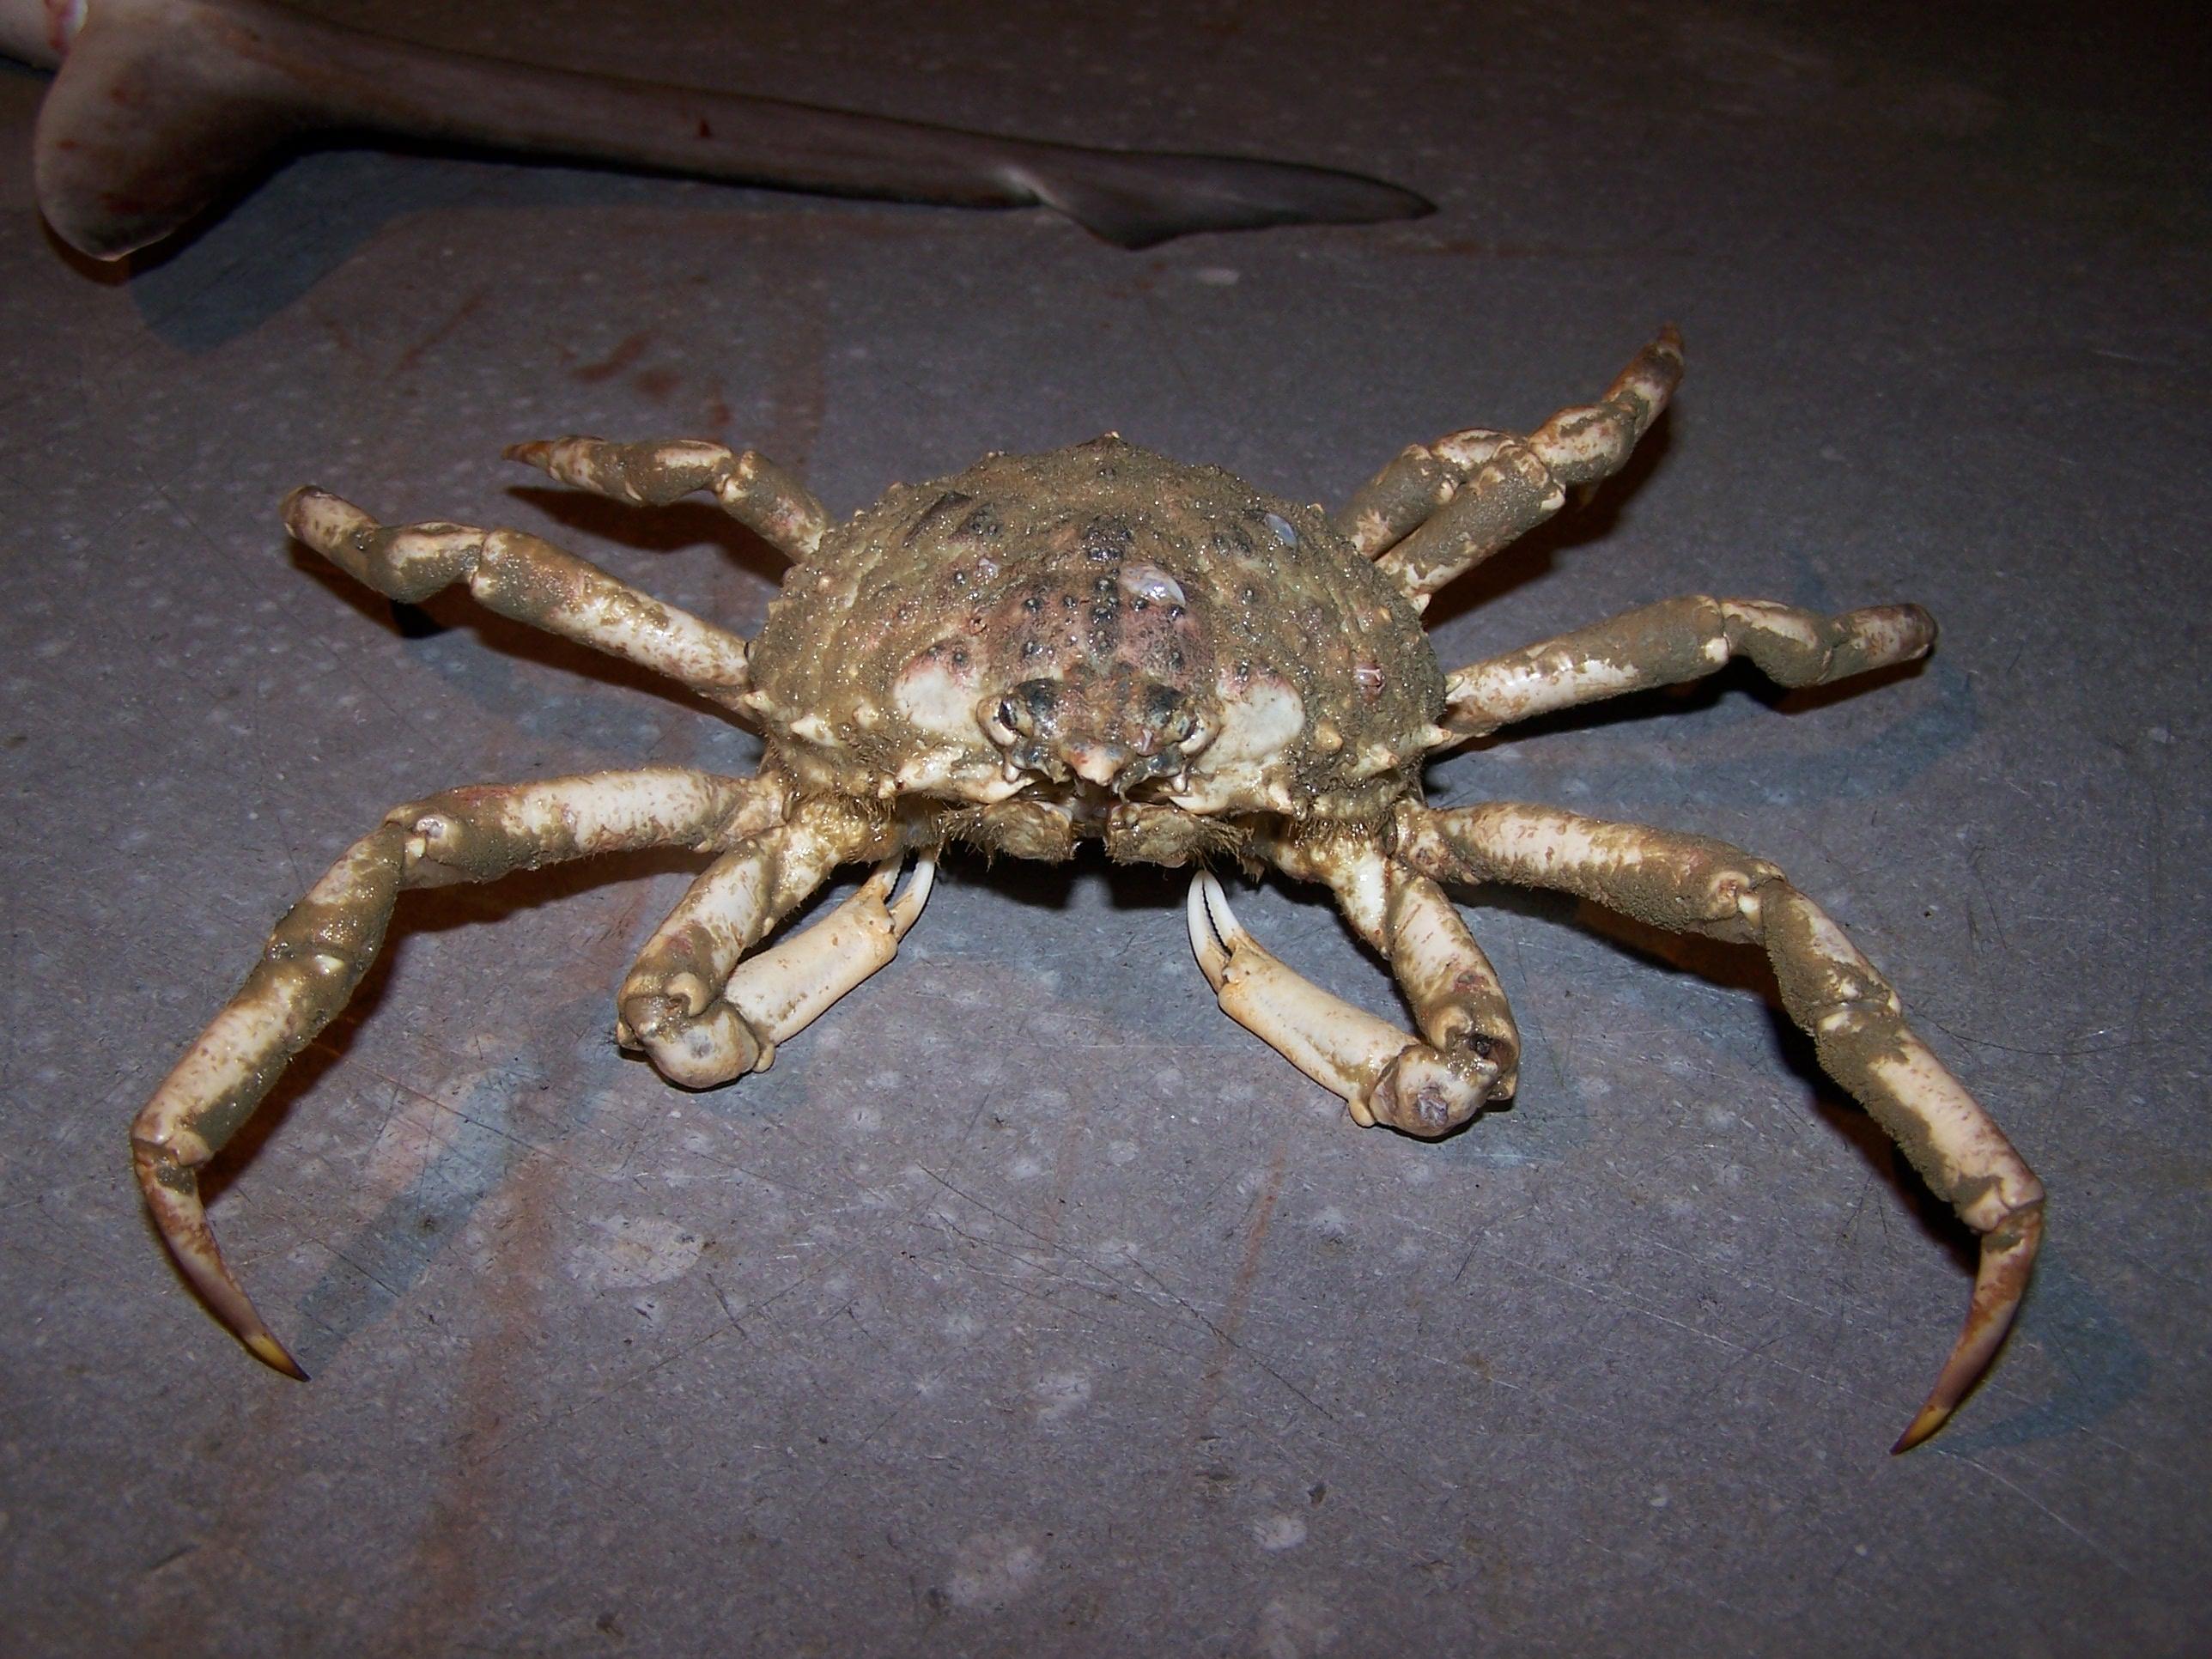 Spiders Of Cape Cod Part - 25: Spider Crab